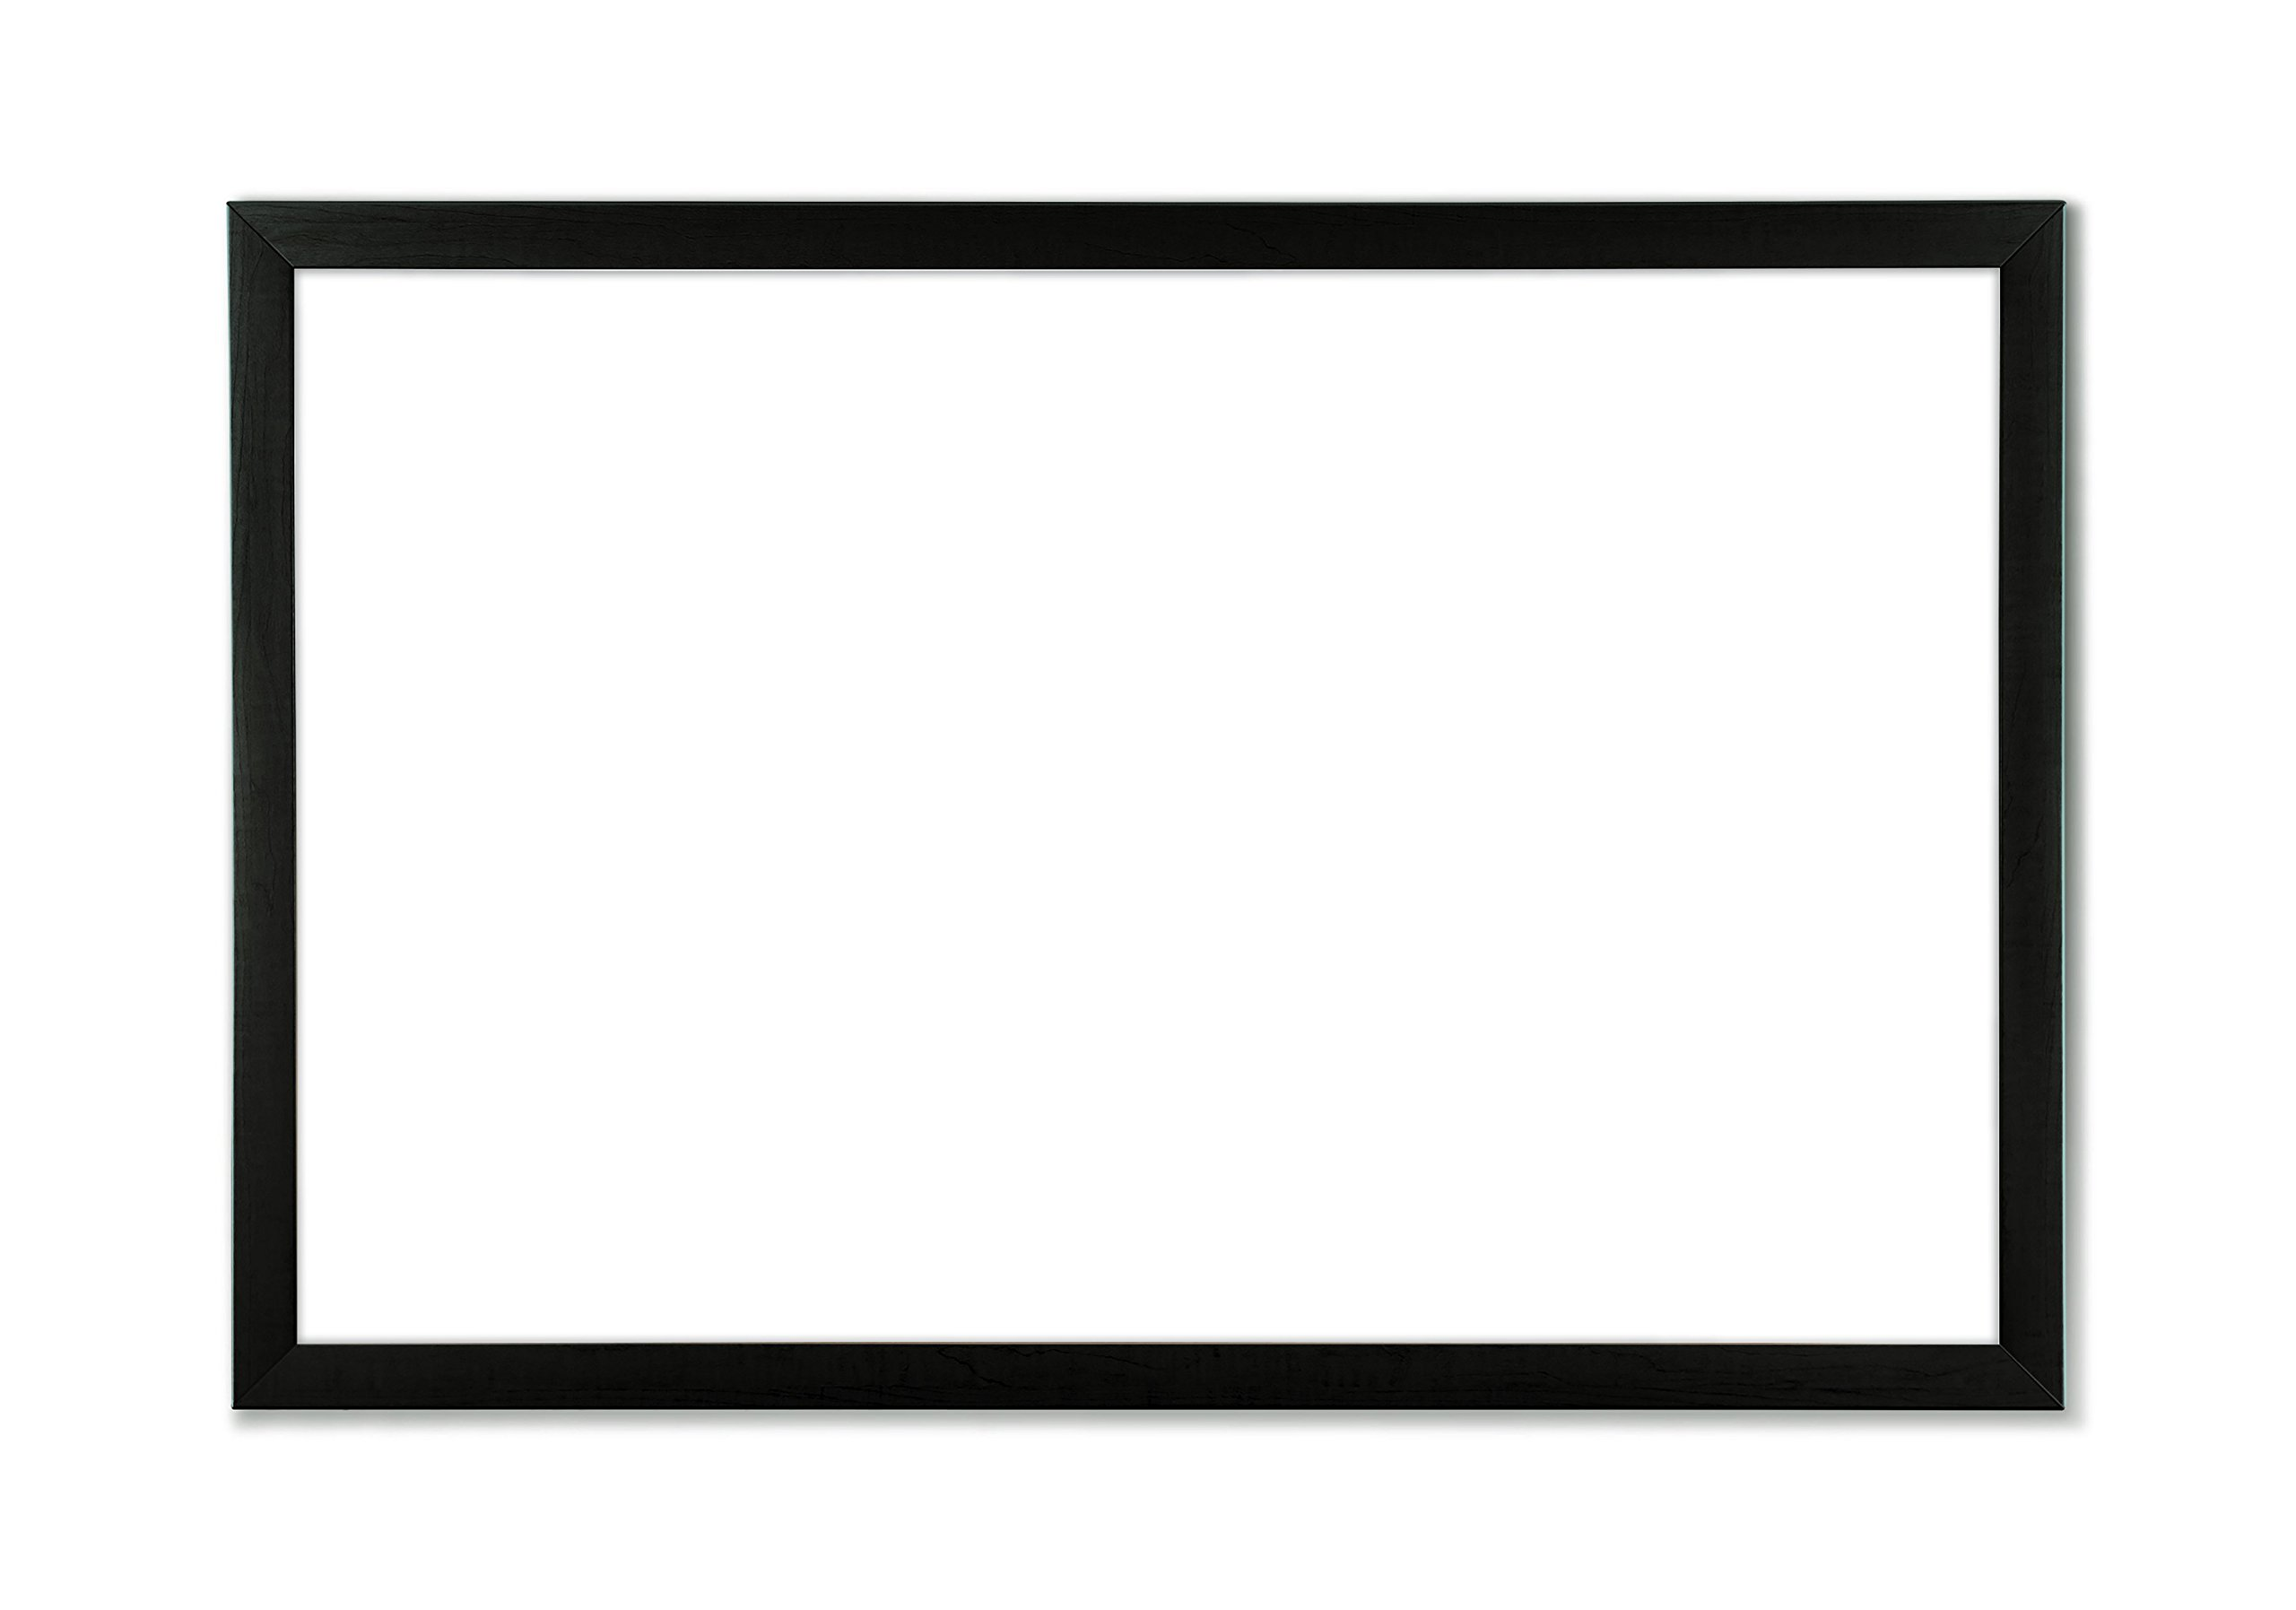 U Brands Magnetic Dry Erase Board, 35 x 23 Inches, Black Frame